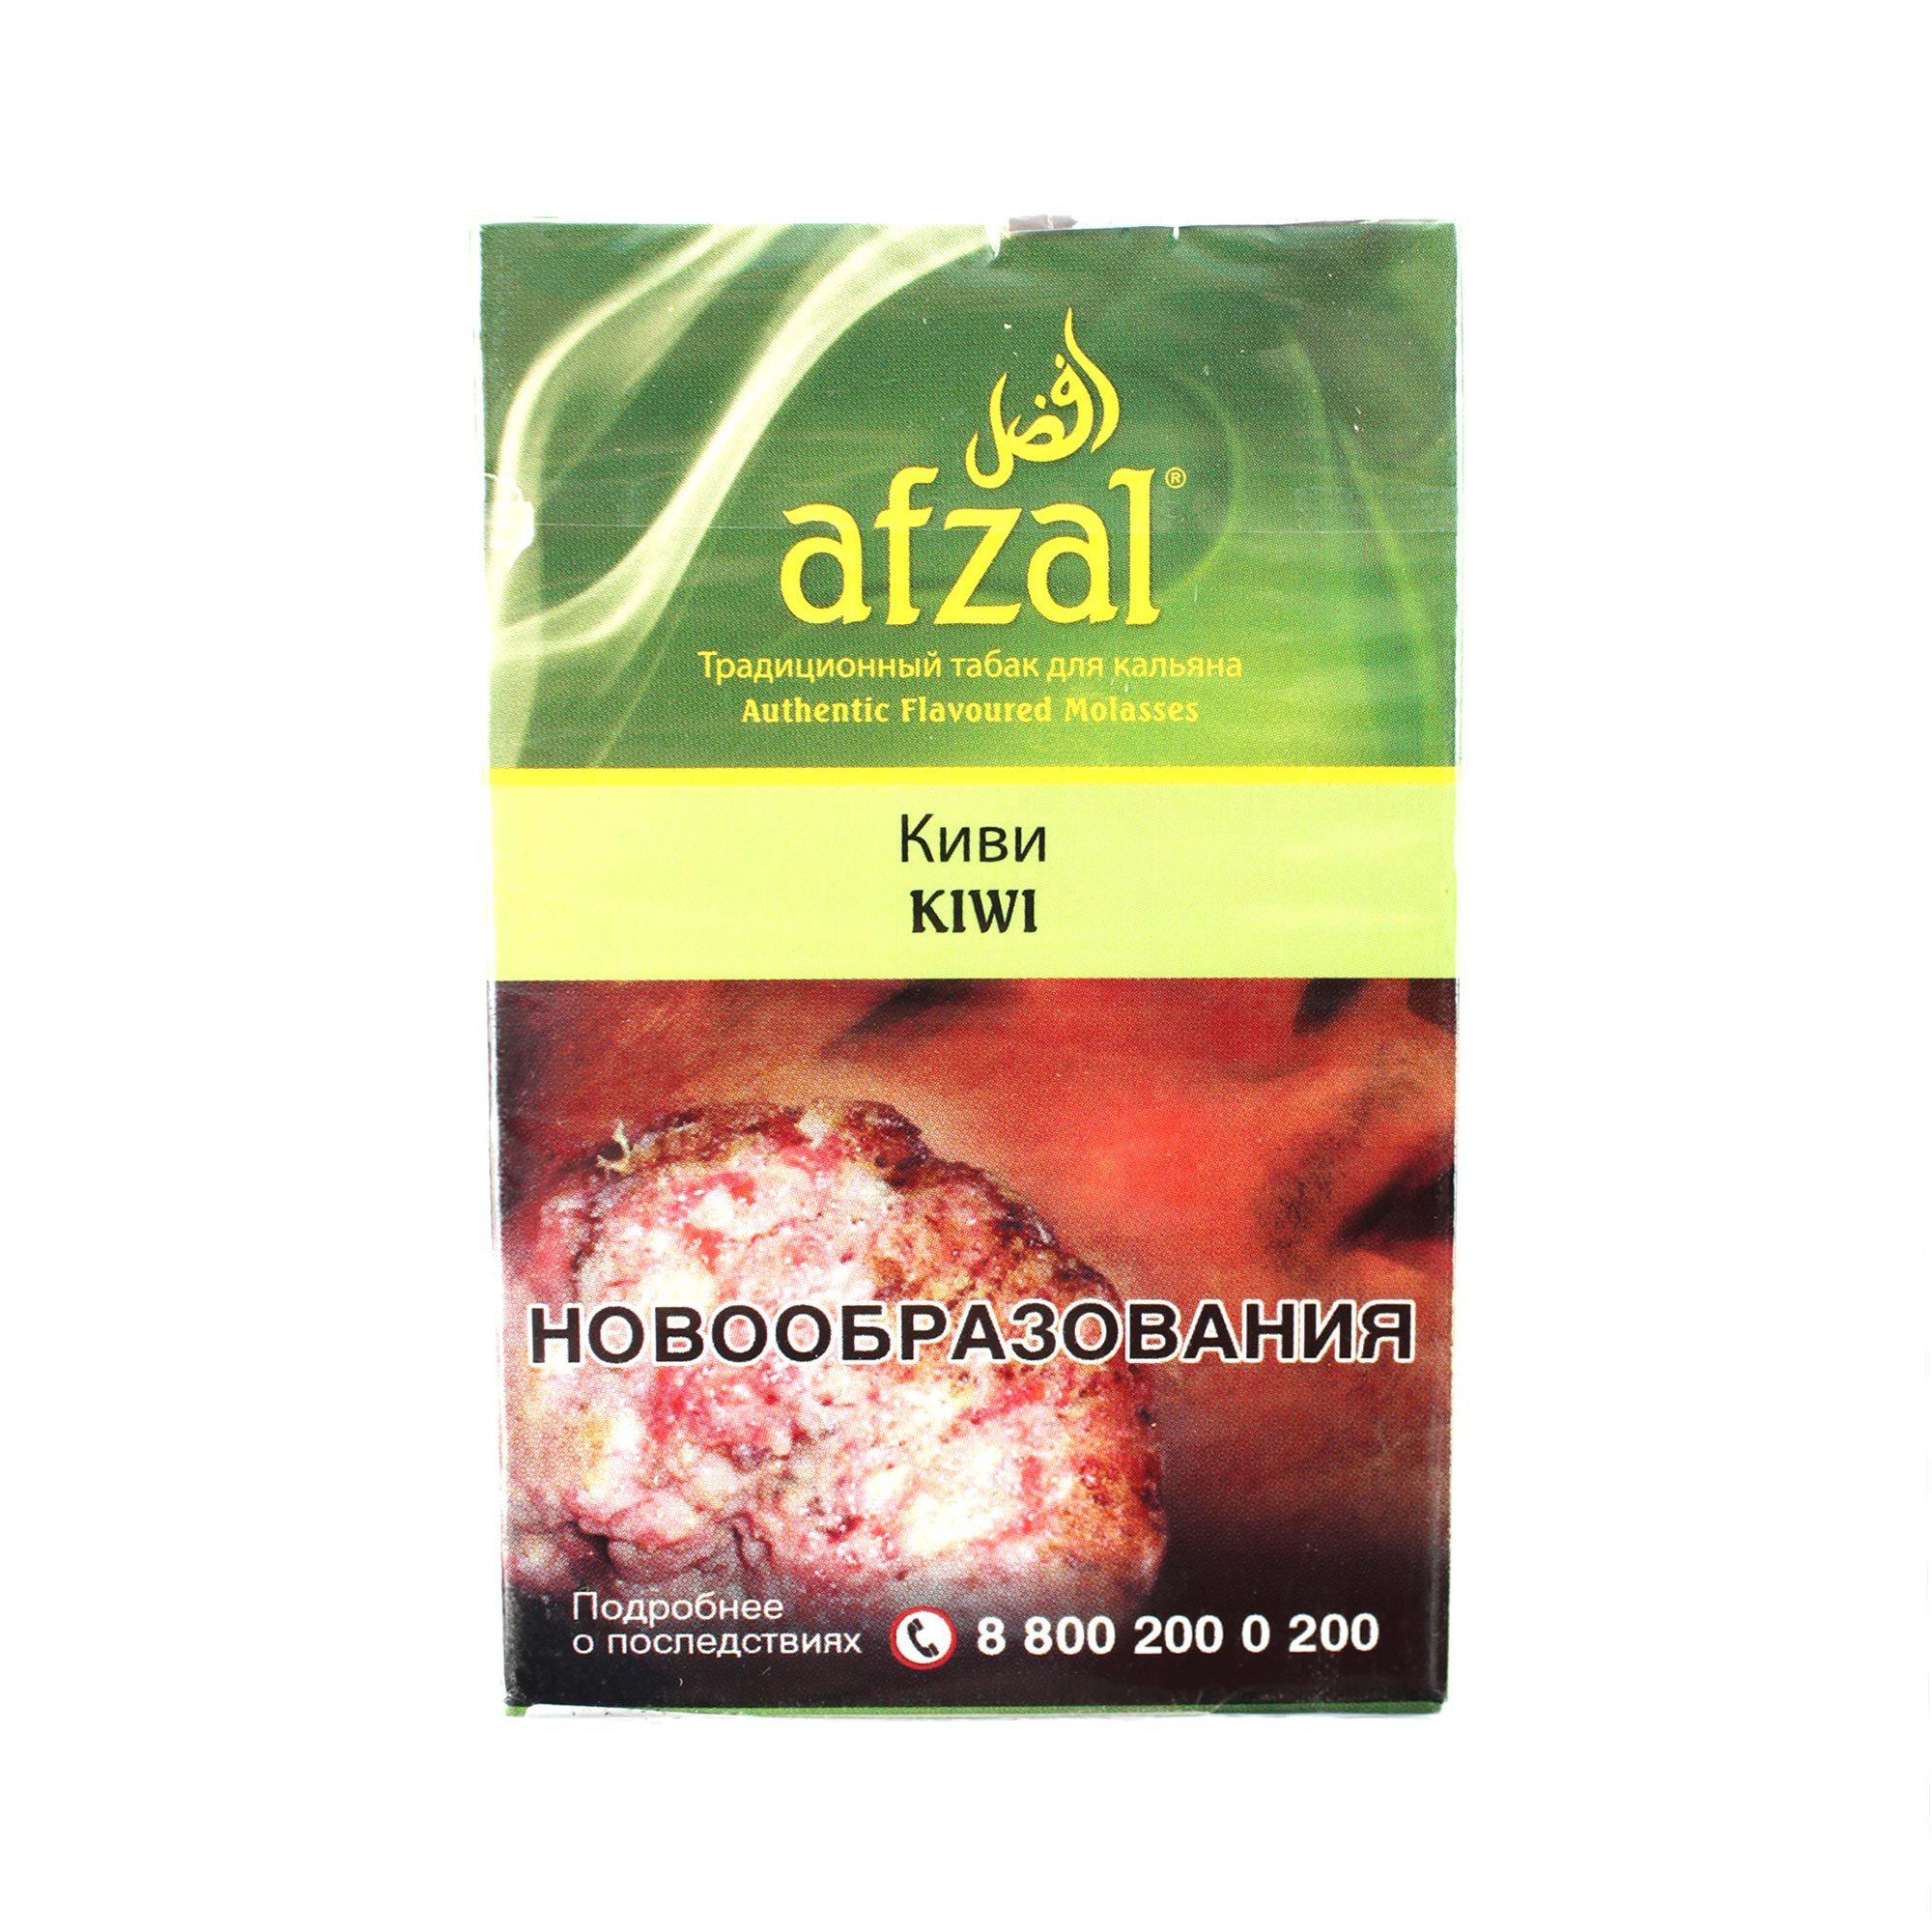 Табак для кальяна Afzal Kiwi Fusion 50 гр